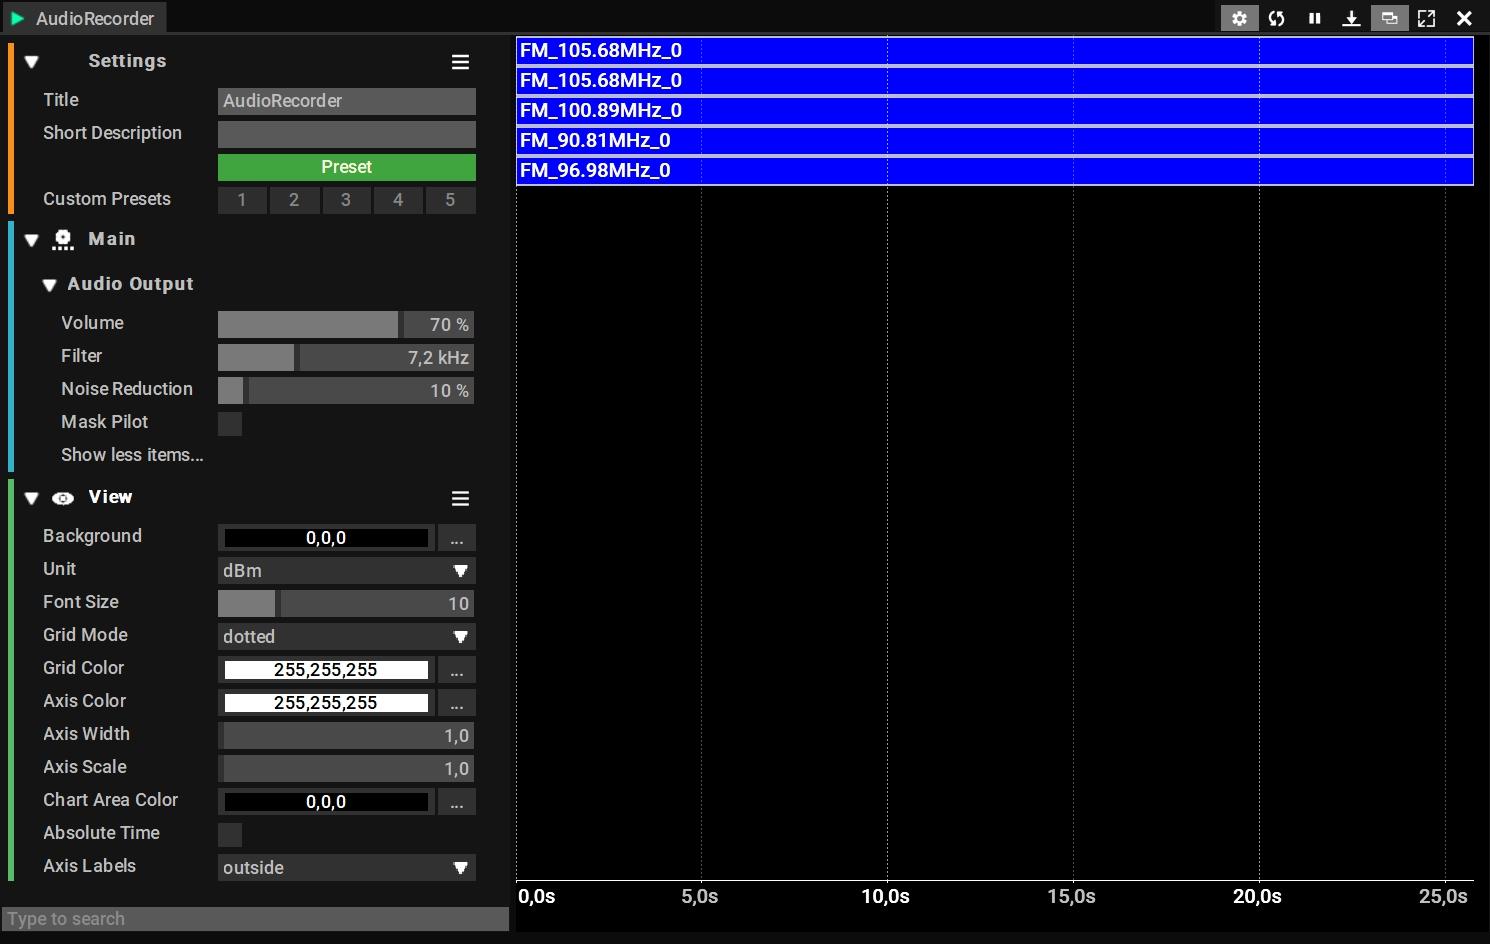 Audio Recoder recording multiple AM/FM channels